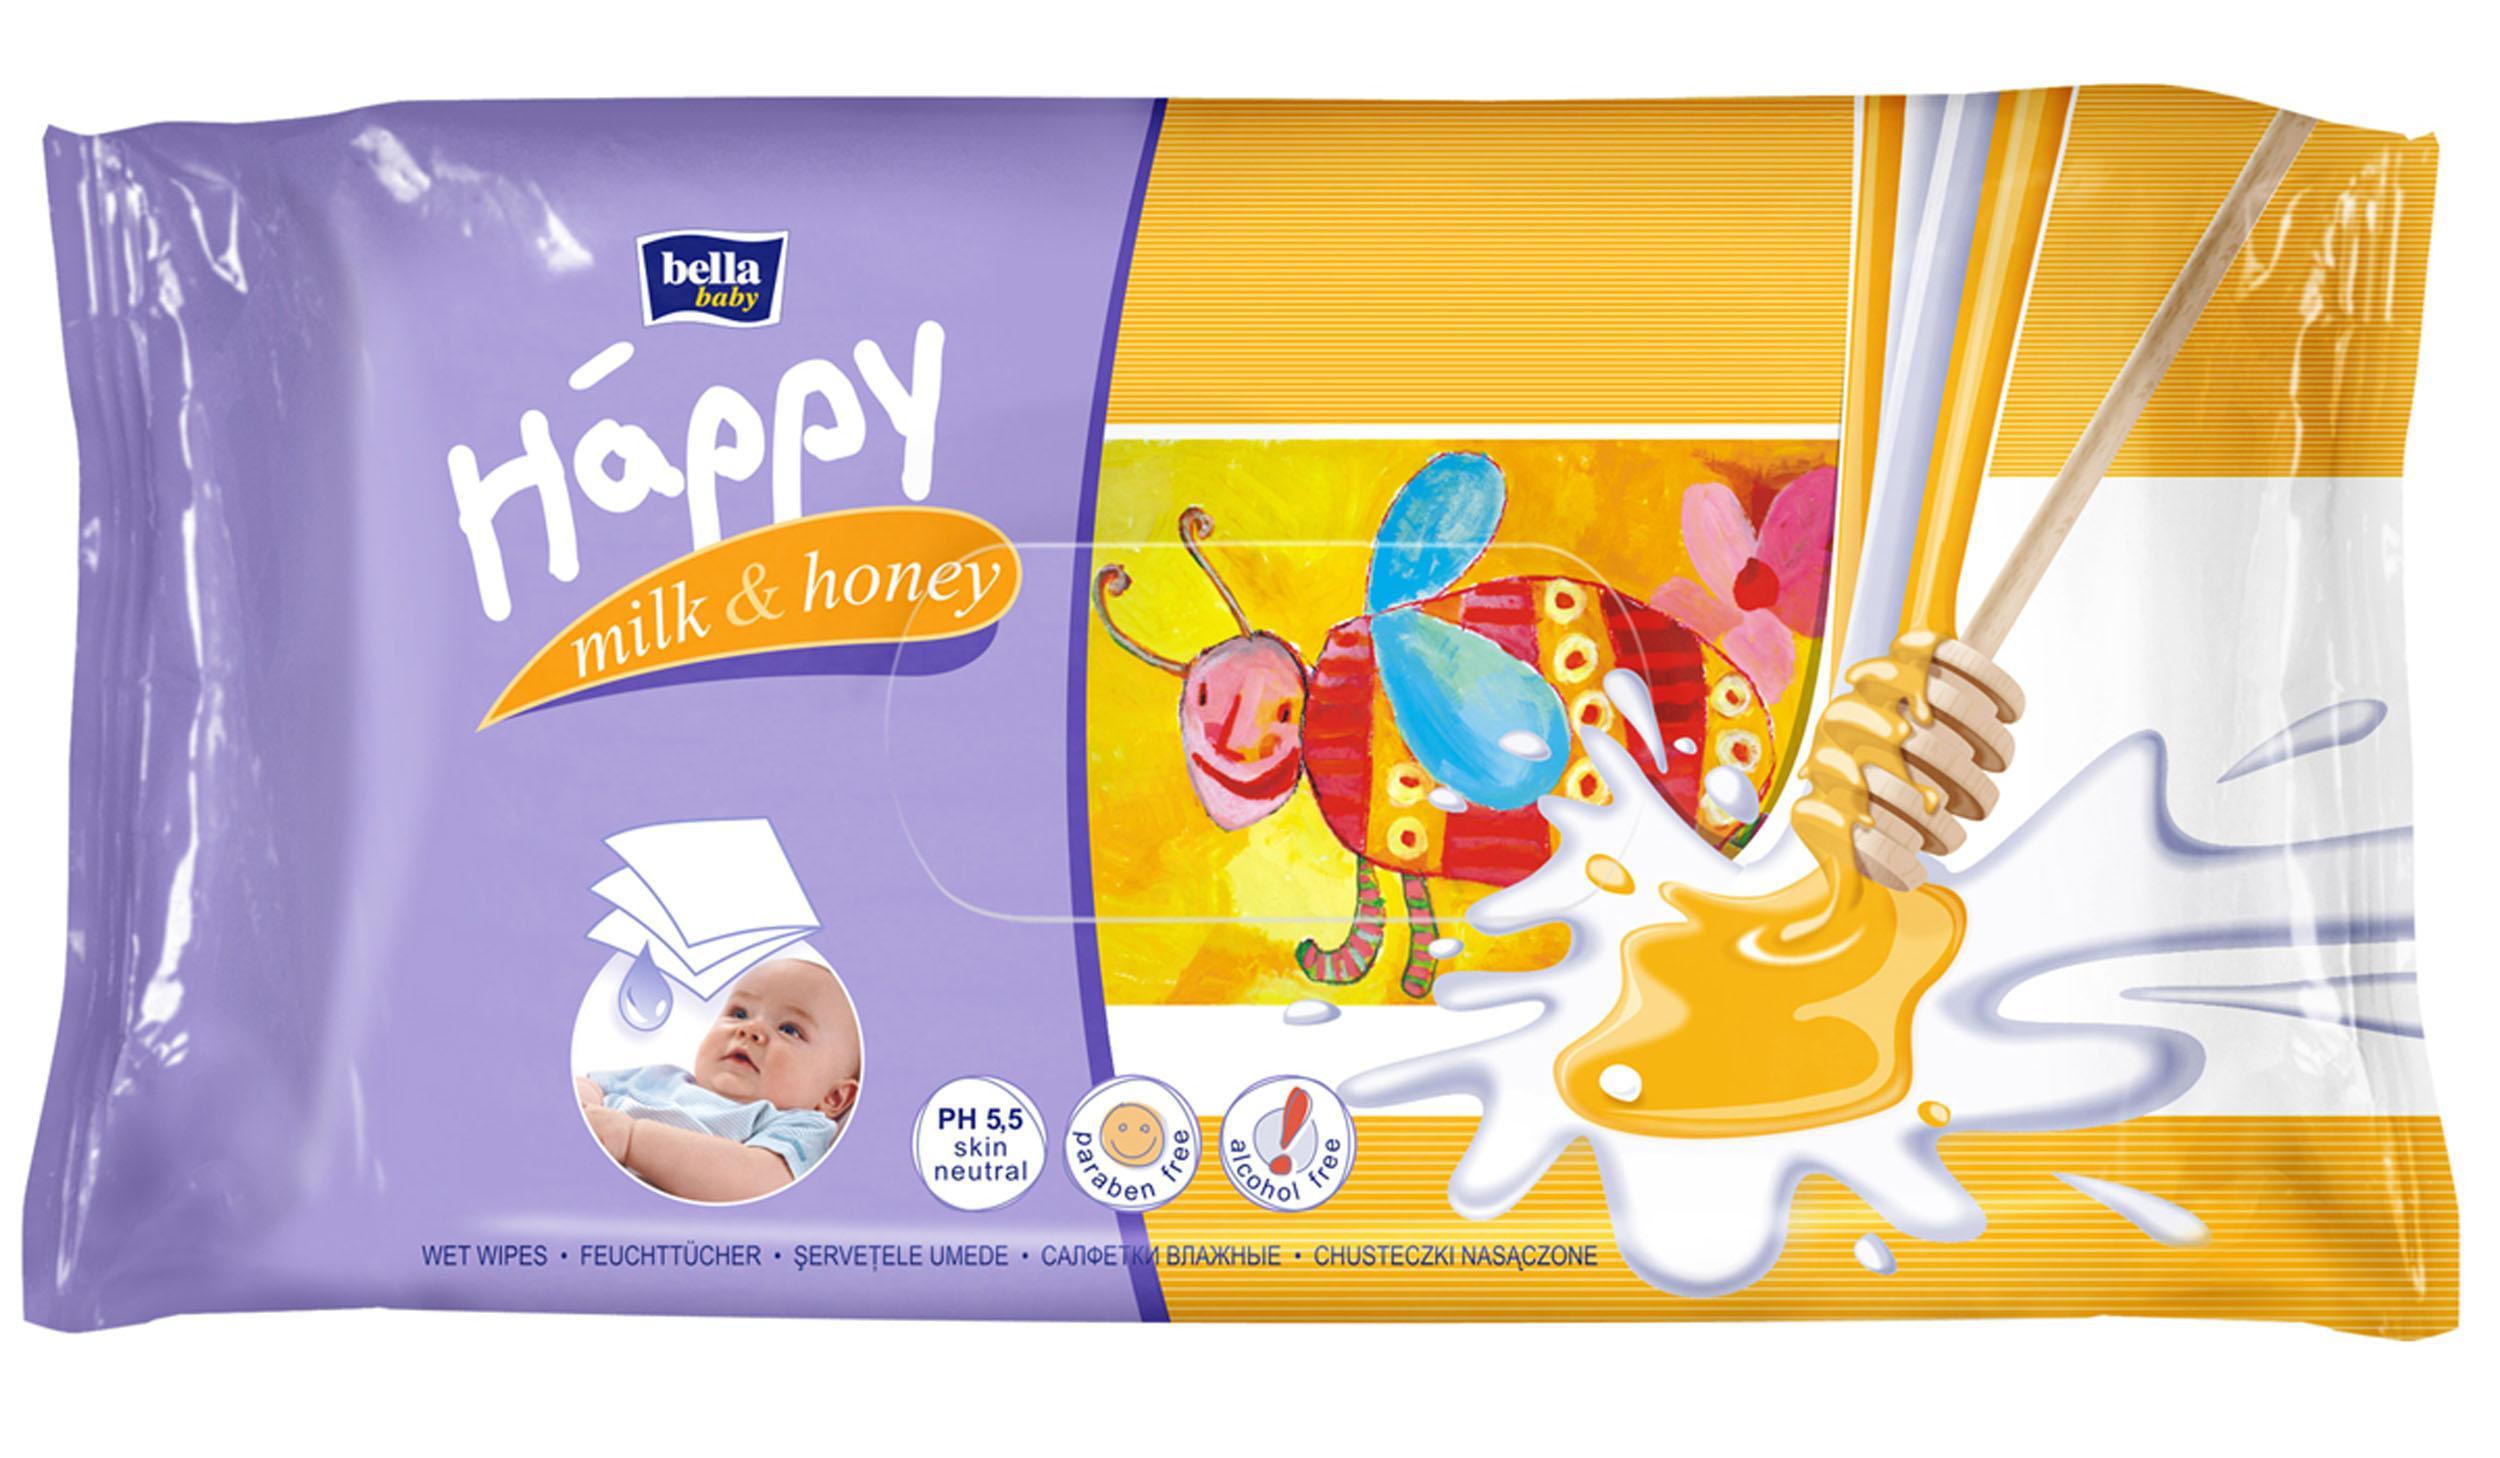 Bella Влажные салфетки Baby Happy Молоко и мед, 64 шт bella влажные салфетки baby happy молоко и мед 64 шт